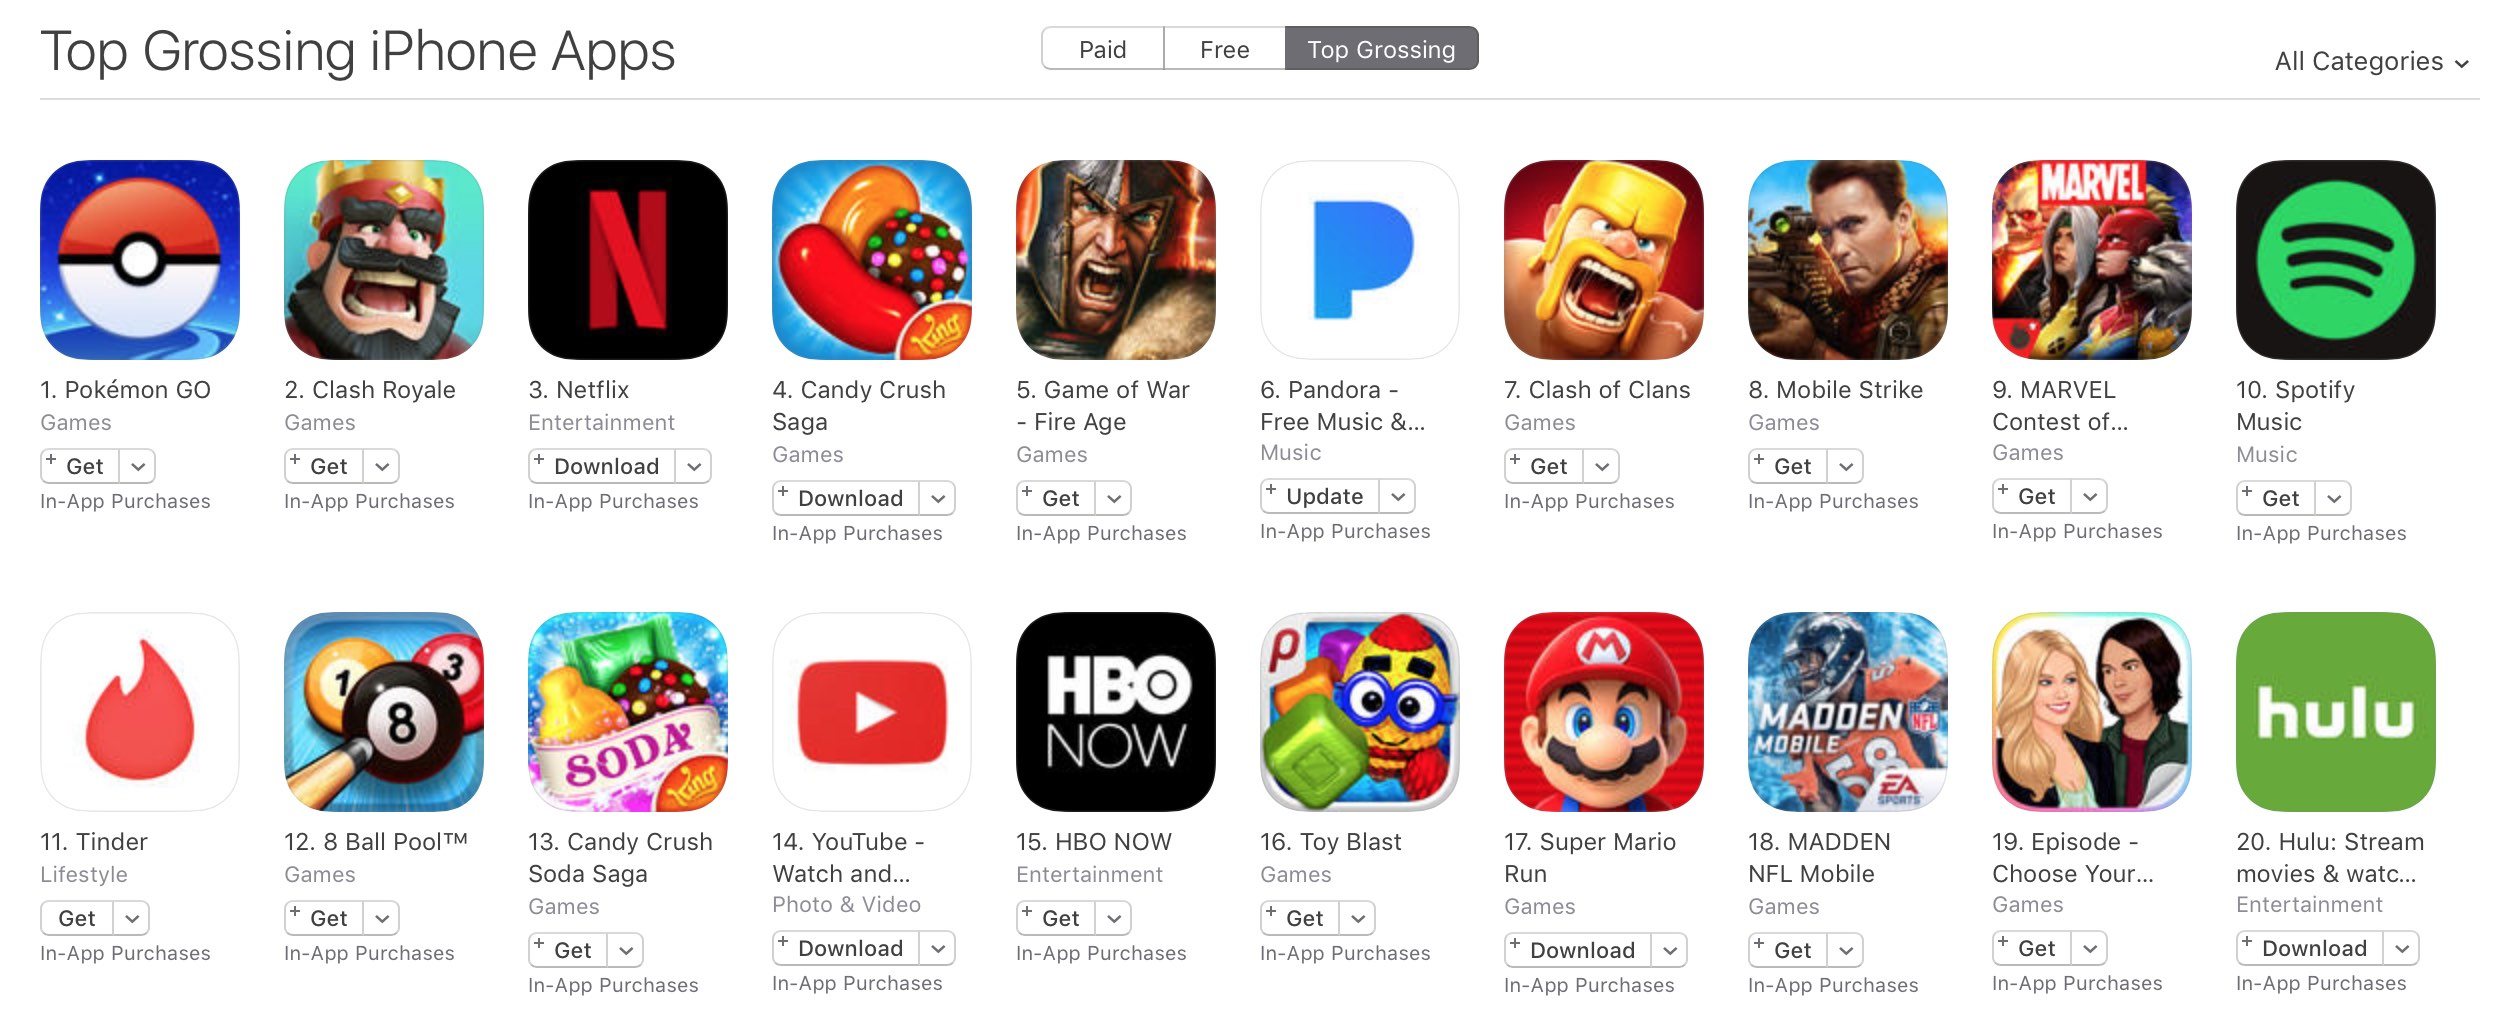 itunes top grossing apps super mario run